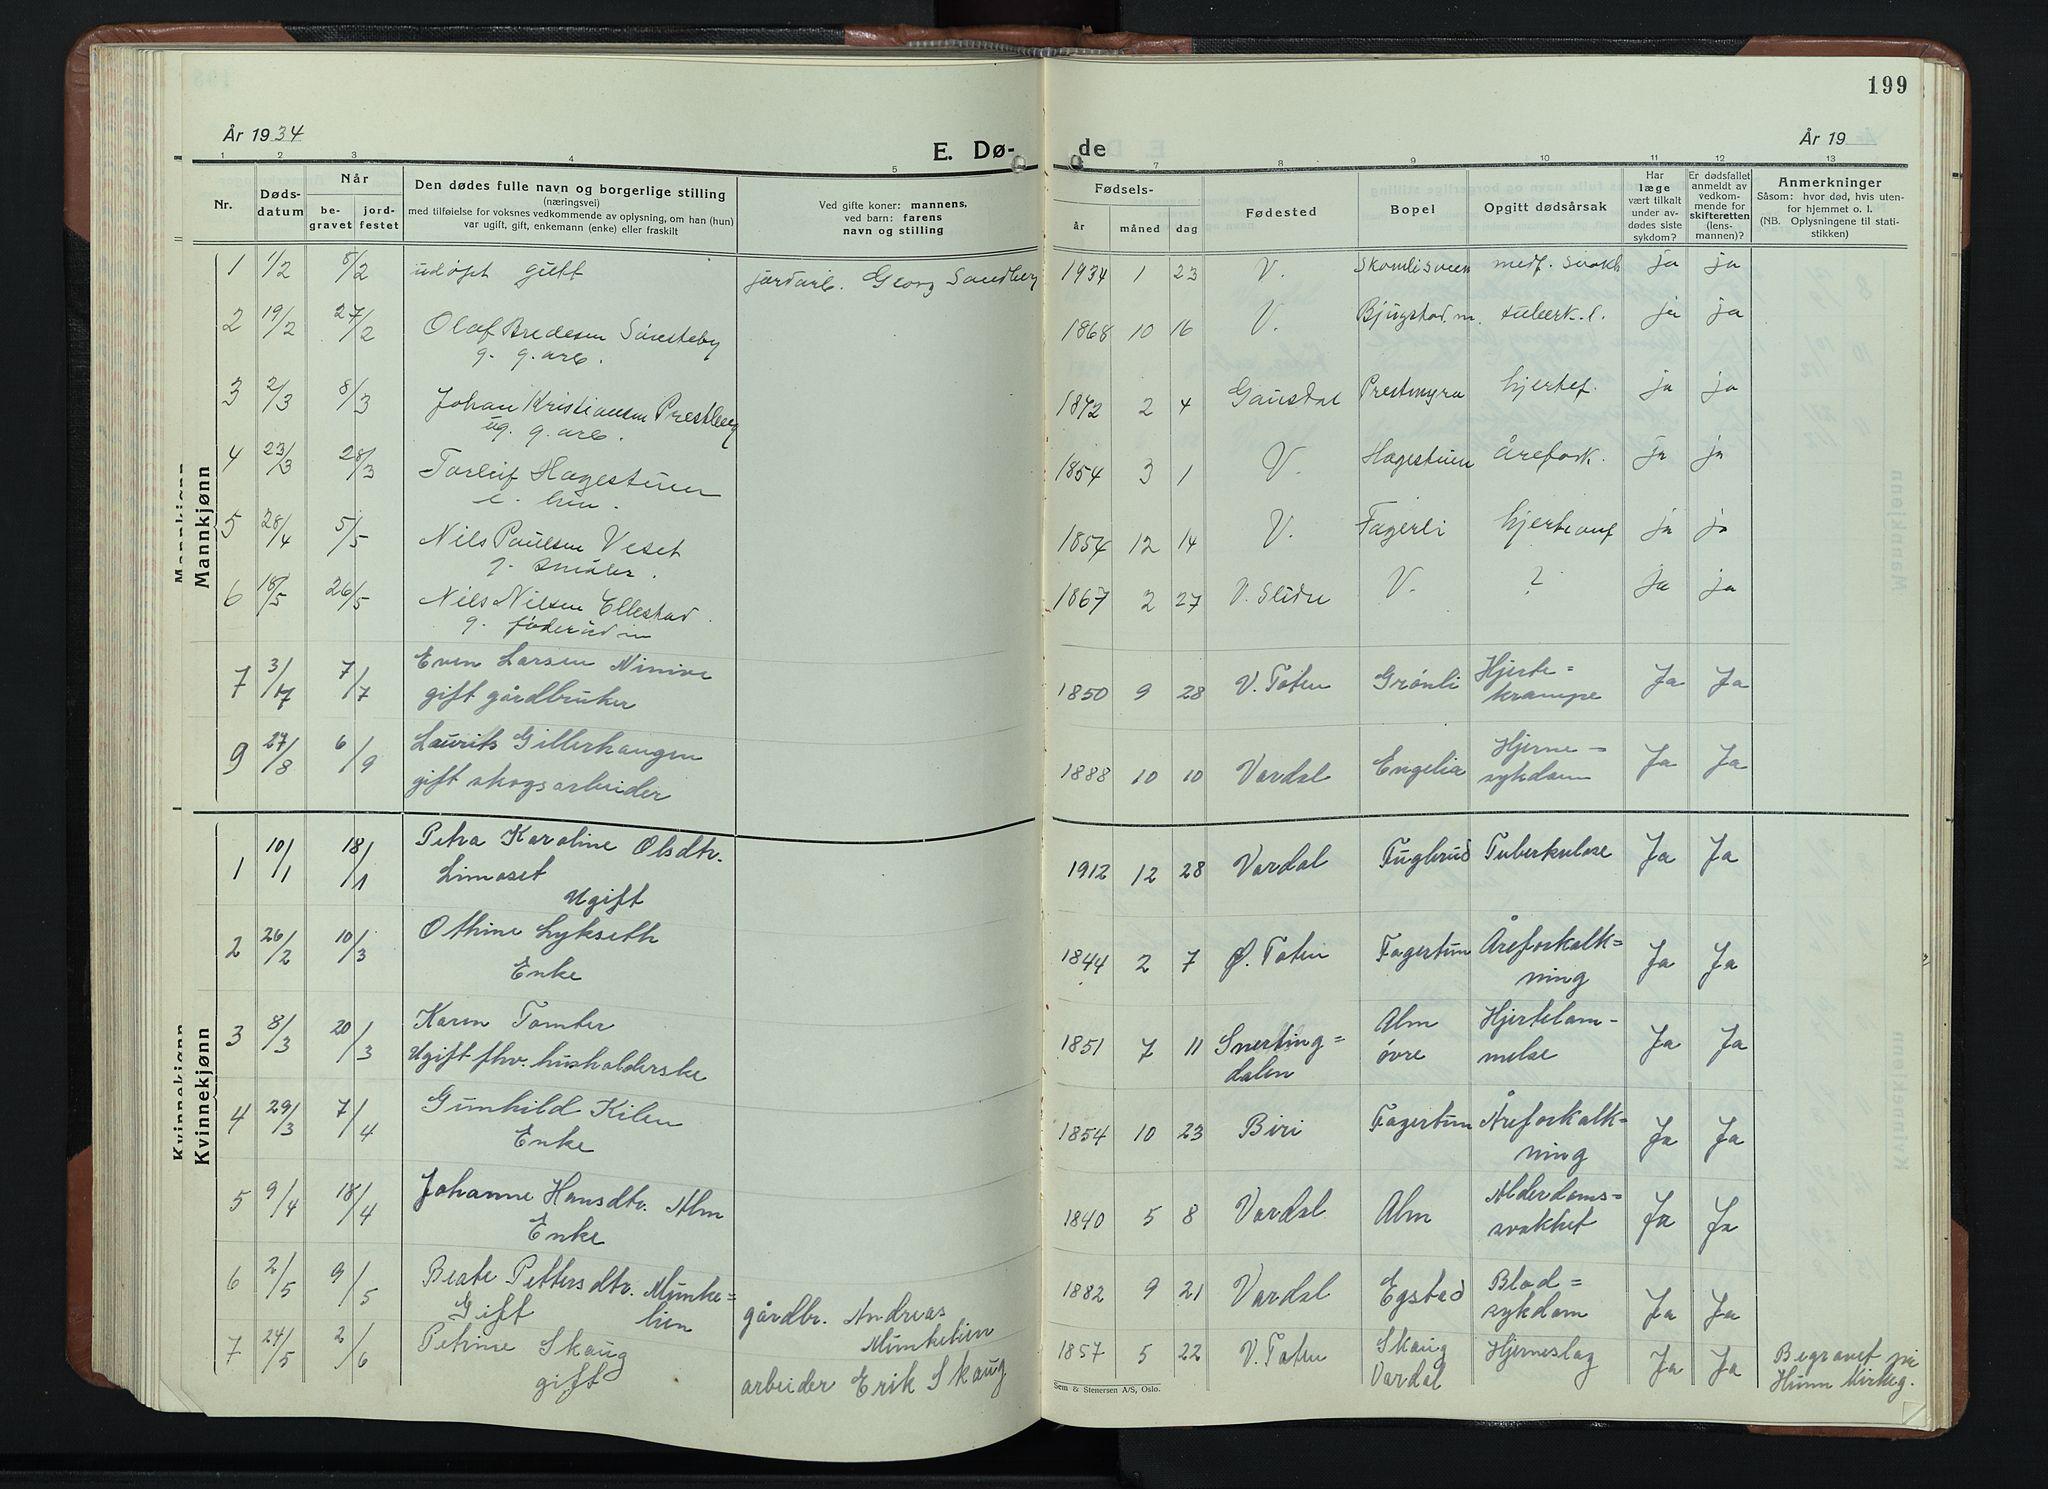 SAH, Vardal prestekontor, H/Ha/Hab/L0018: Klokkerbok nr. 18, 1931-1951, s. 199